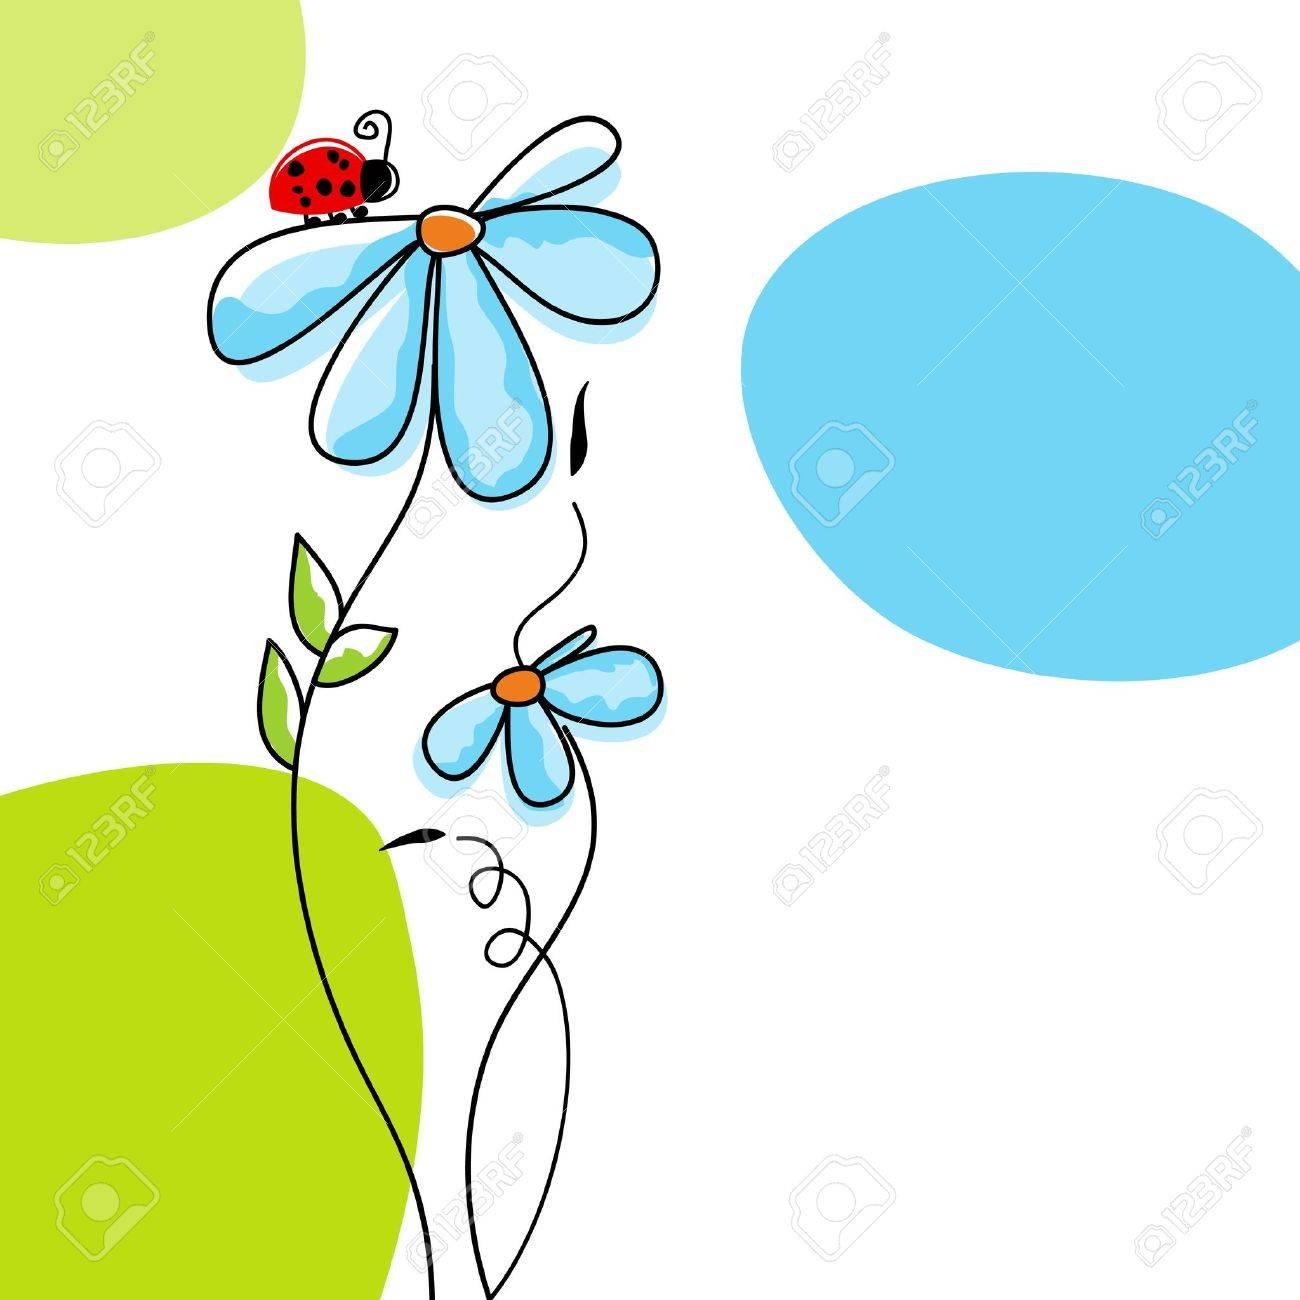 Cute nature scene: ladybug climbing on a flower Stock Vector - 9533723